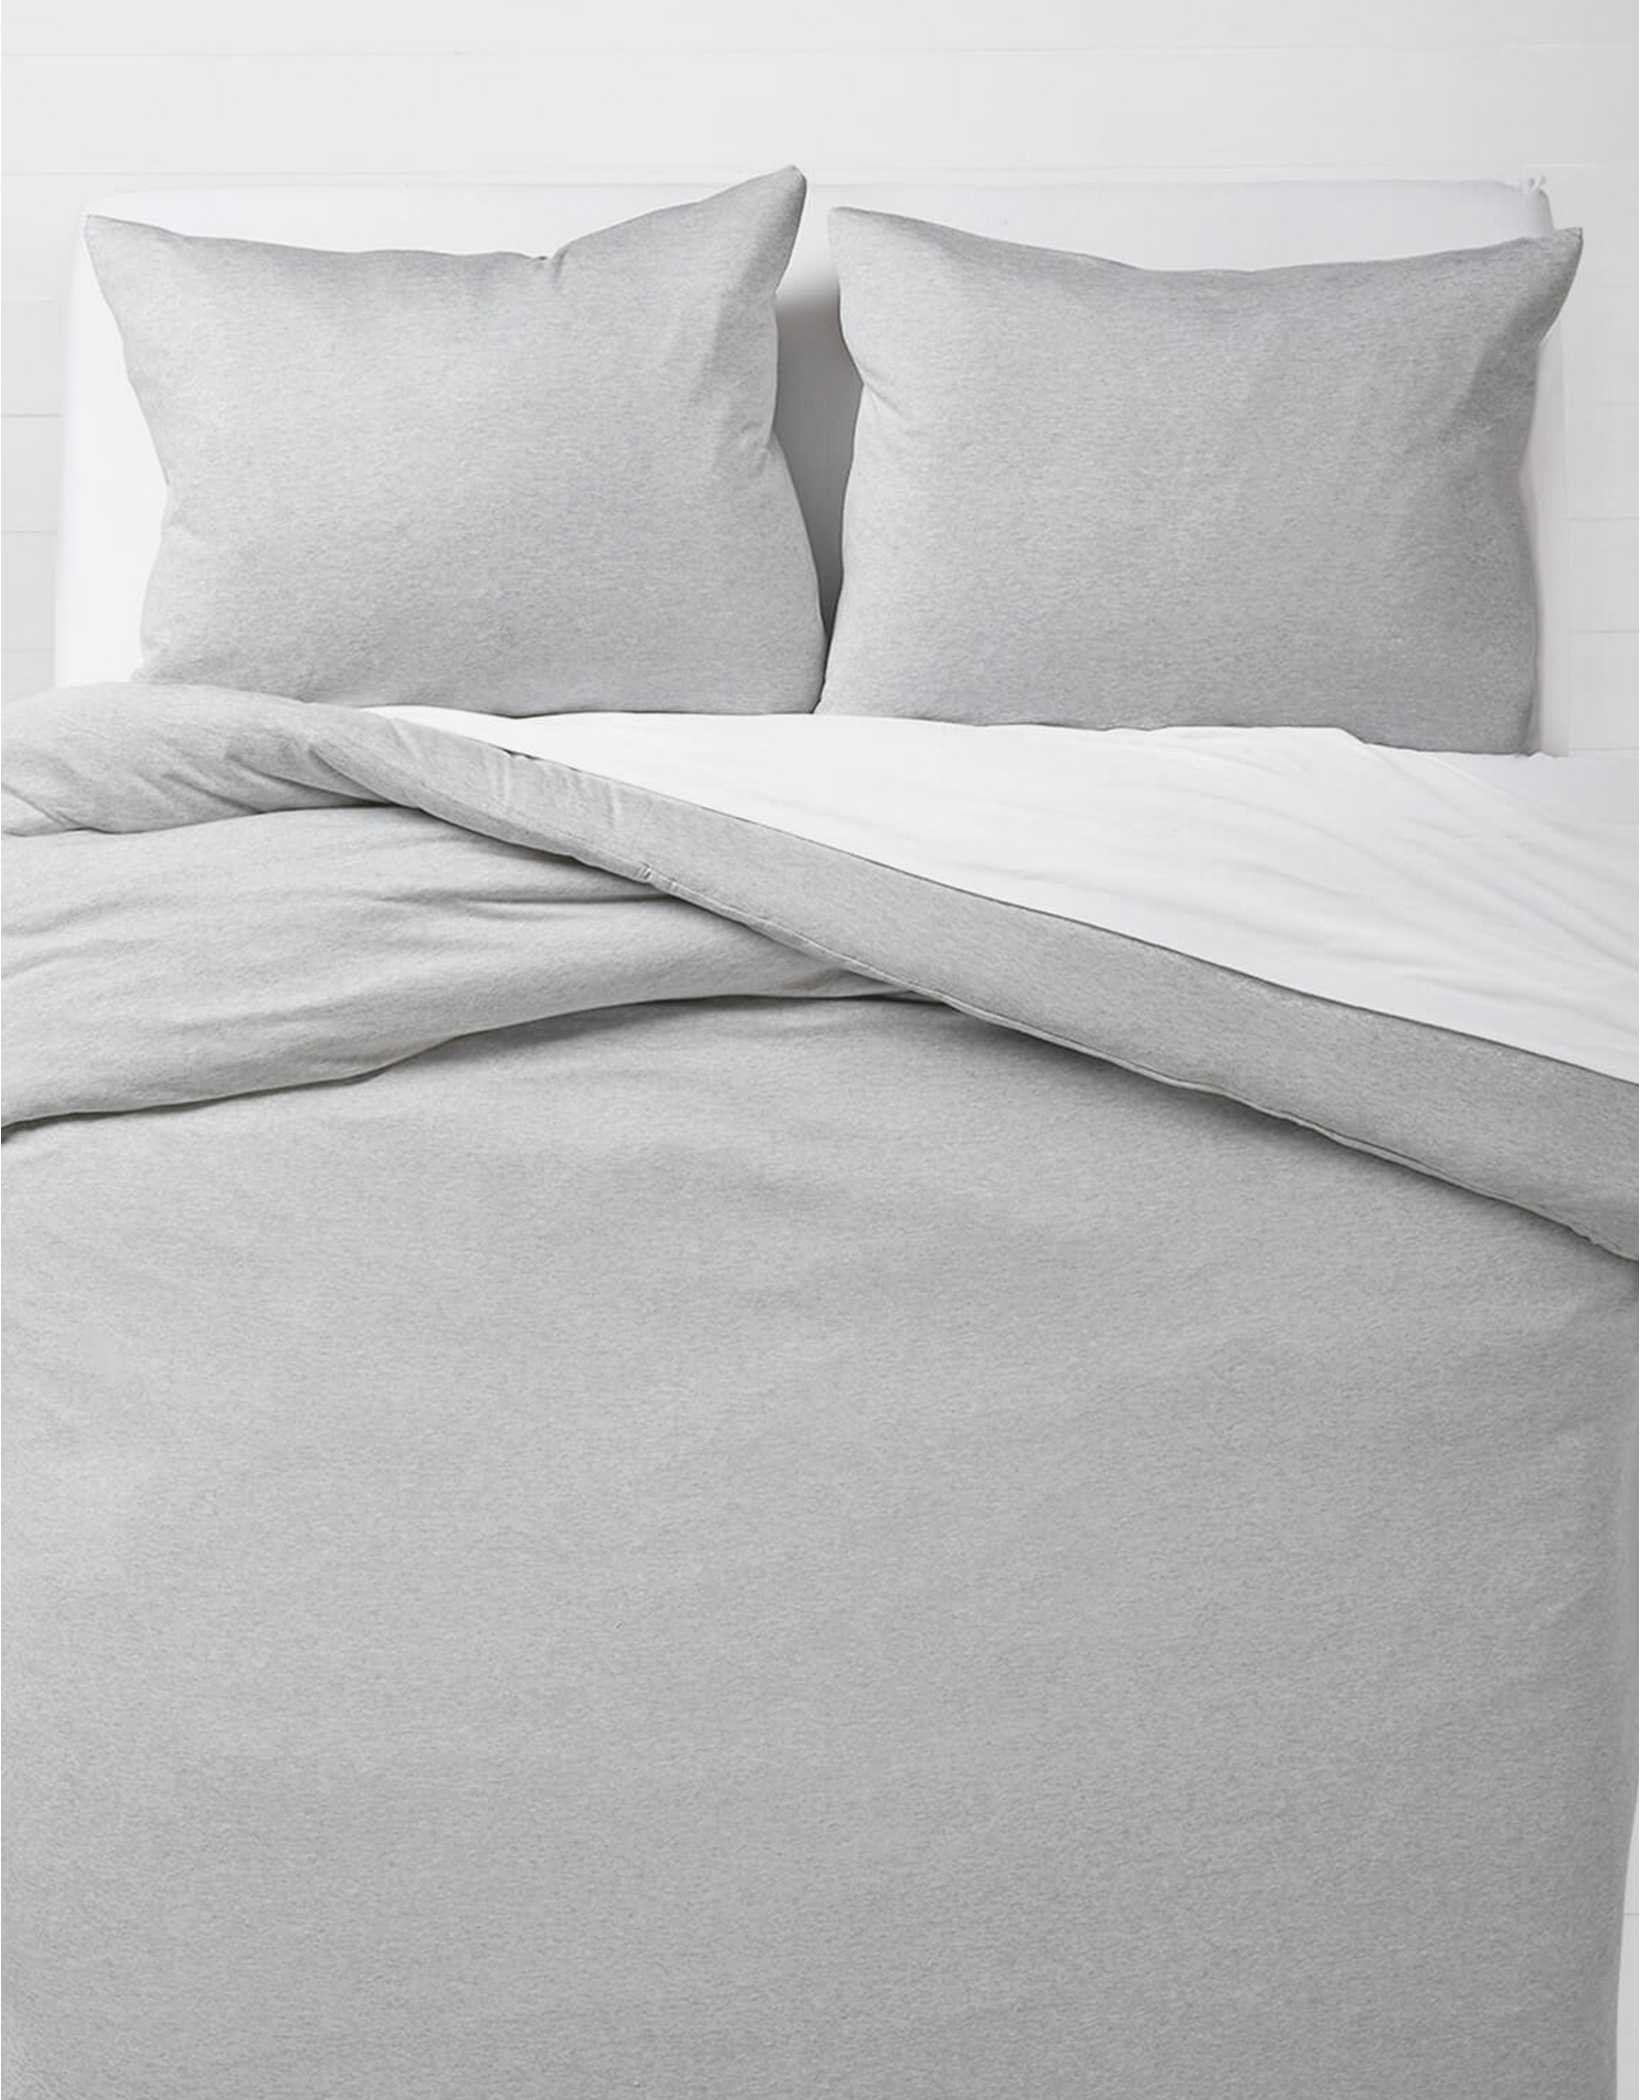 Dormify T-Shirt Jersey Queen Comforter & Sham Set